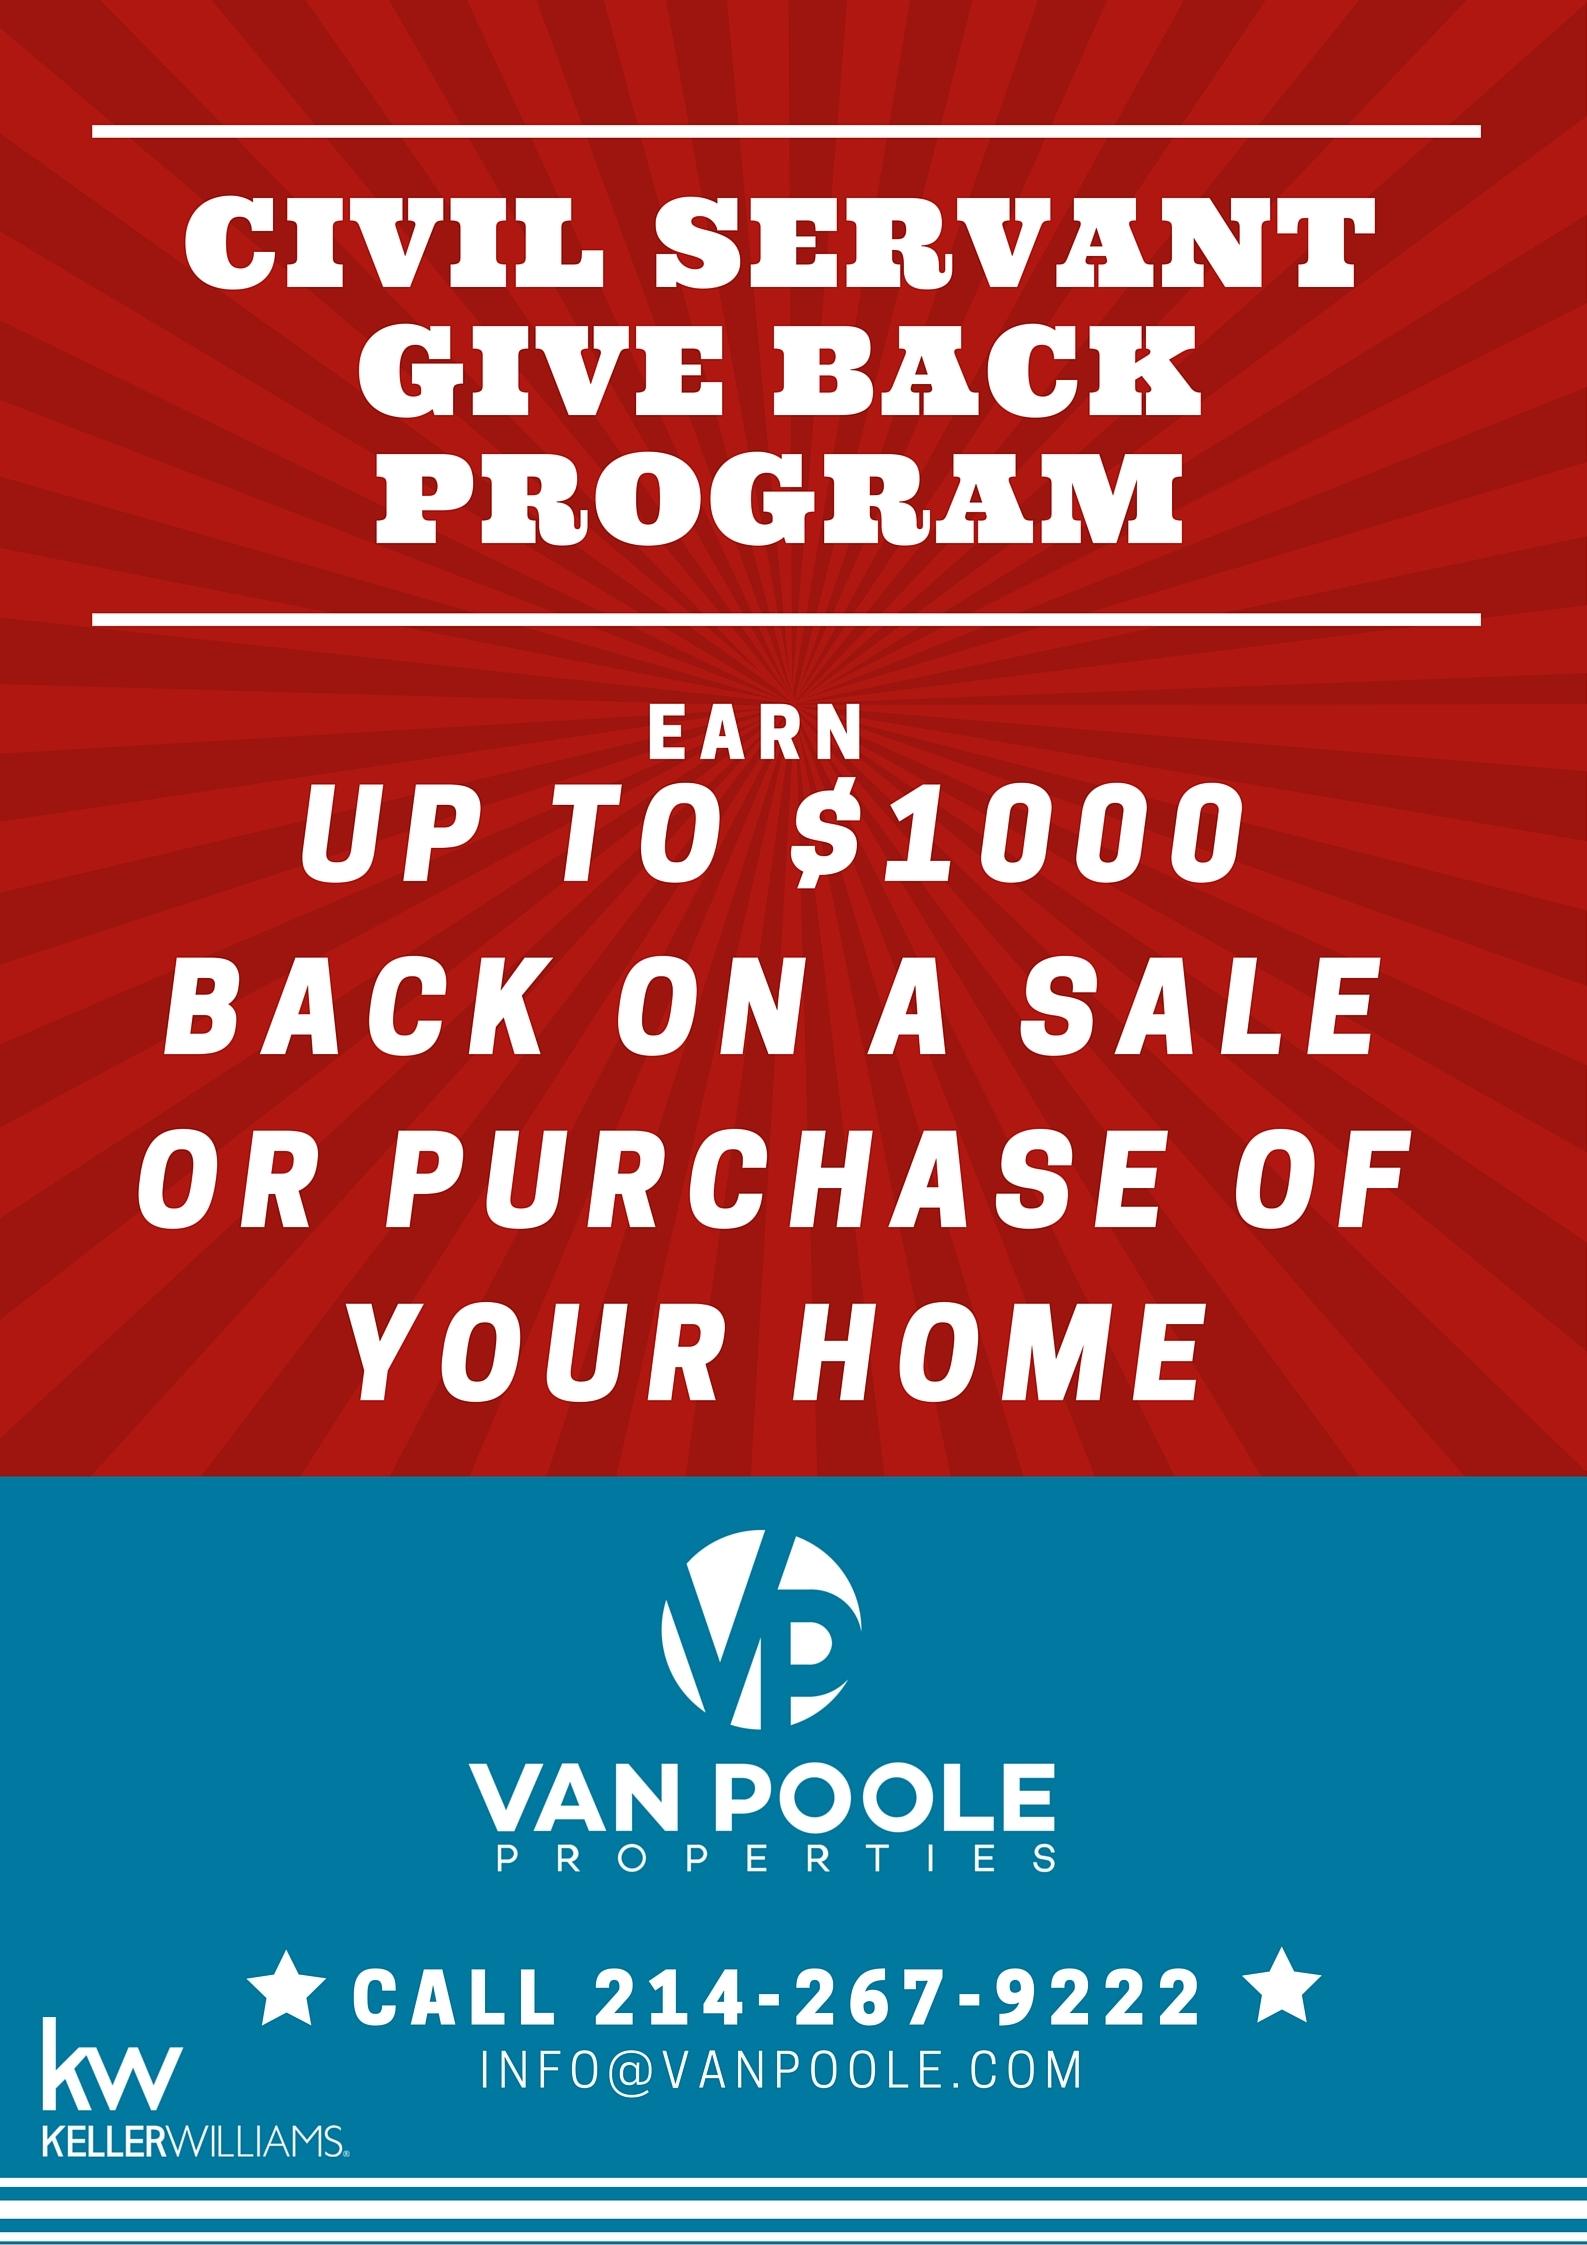 Civil Servant Give Back Program